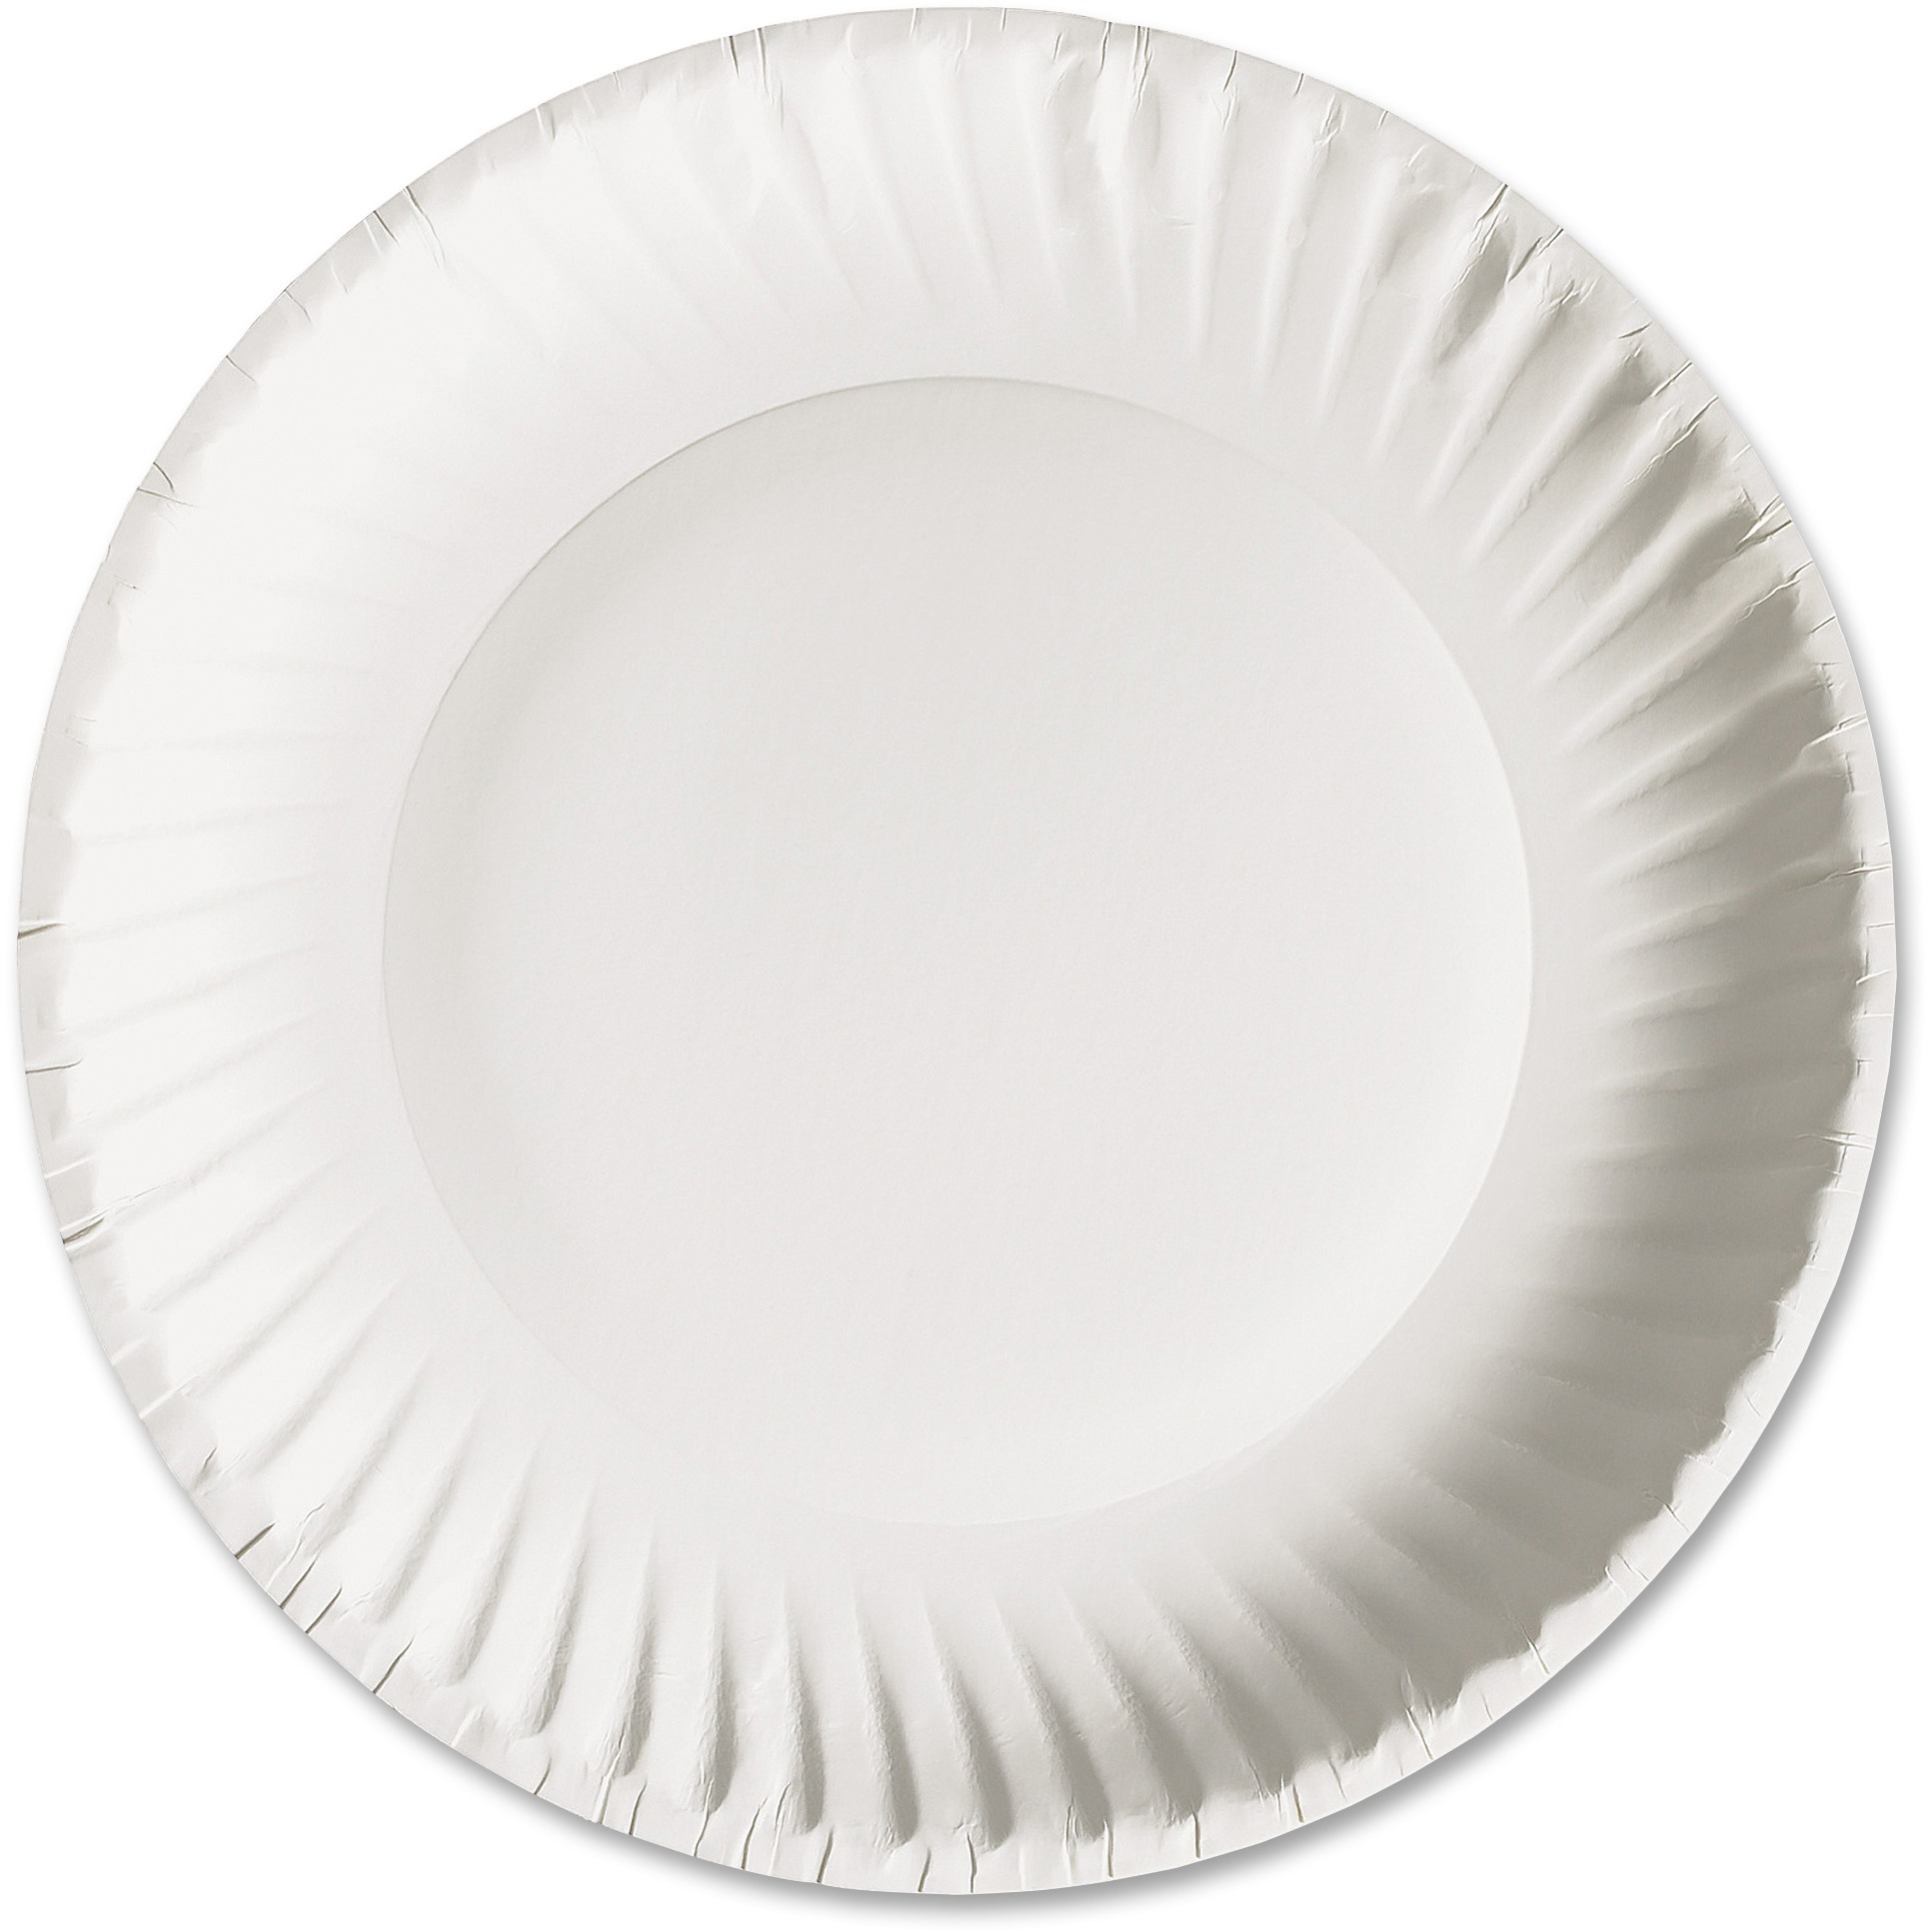 "AJM Packaging Corporation White Paper Plates, 9"" Diameter, 100/bag, 10 Bags/carton"